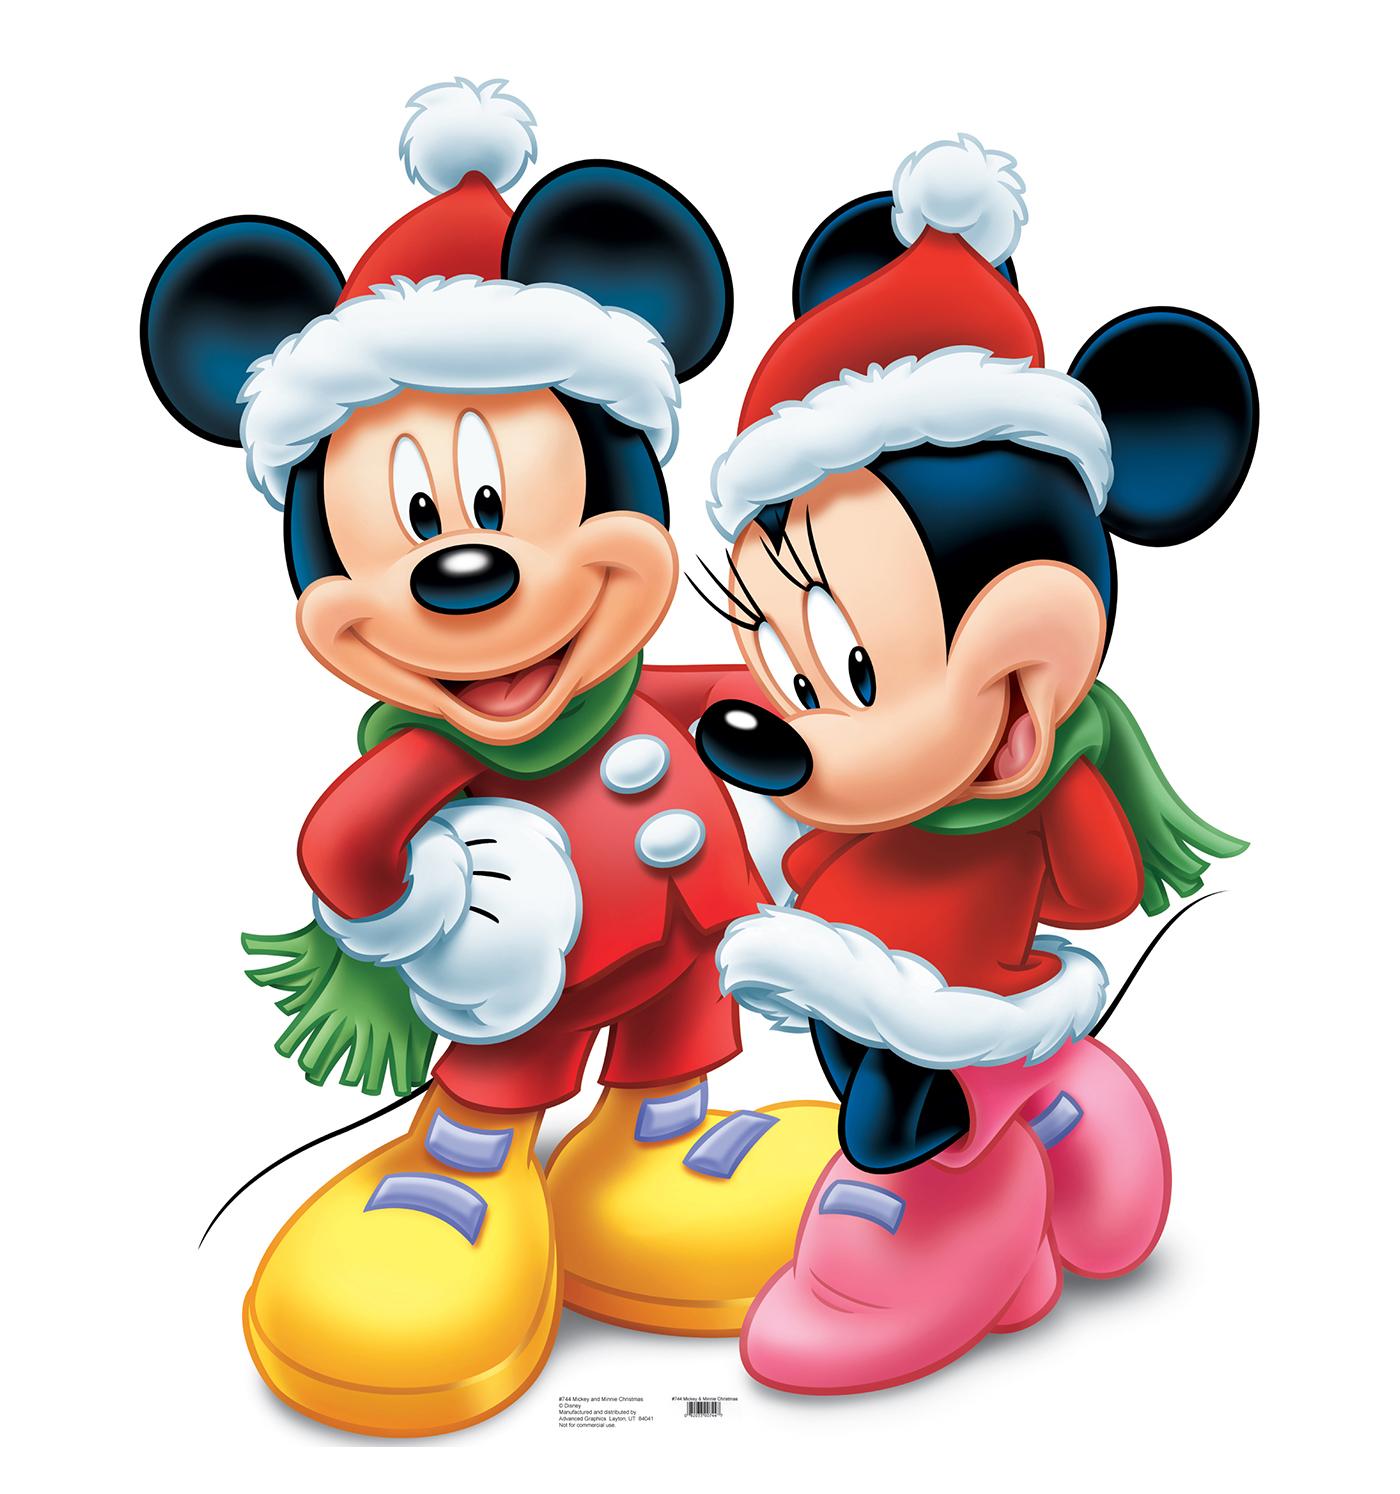 Mickey And Minnie Wallpapers Cartoon Hq Mickey And Minnie